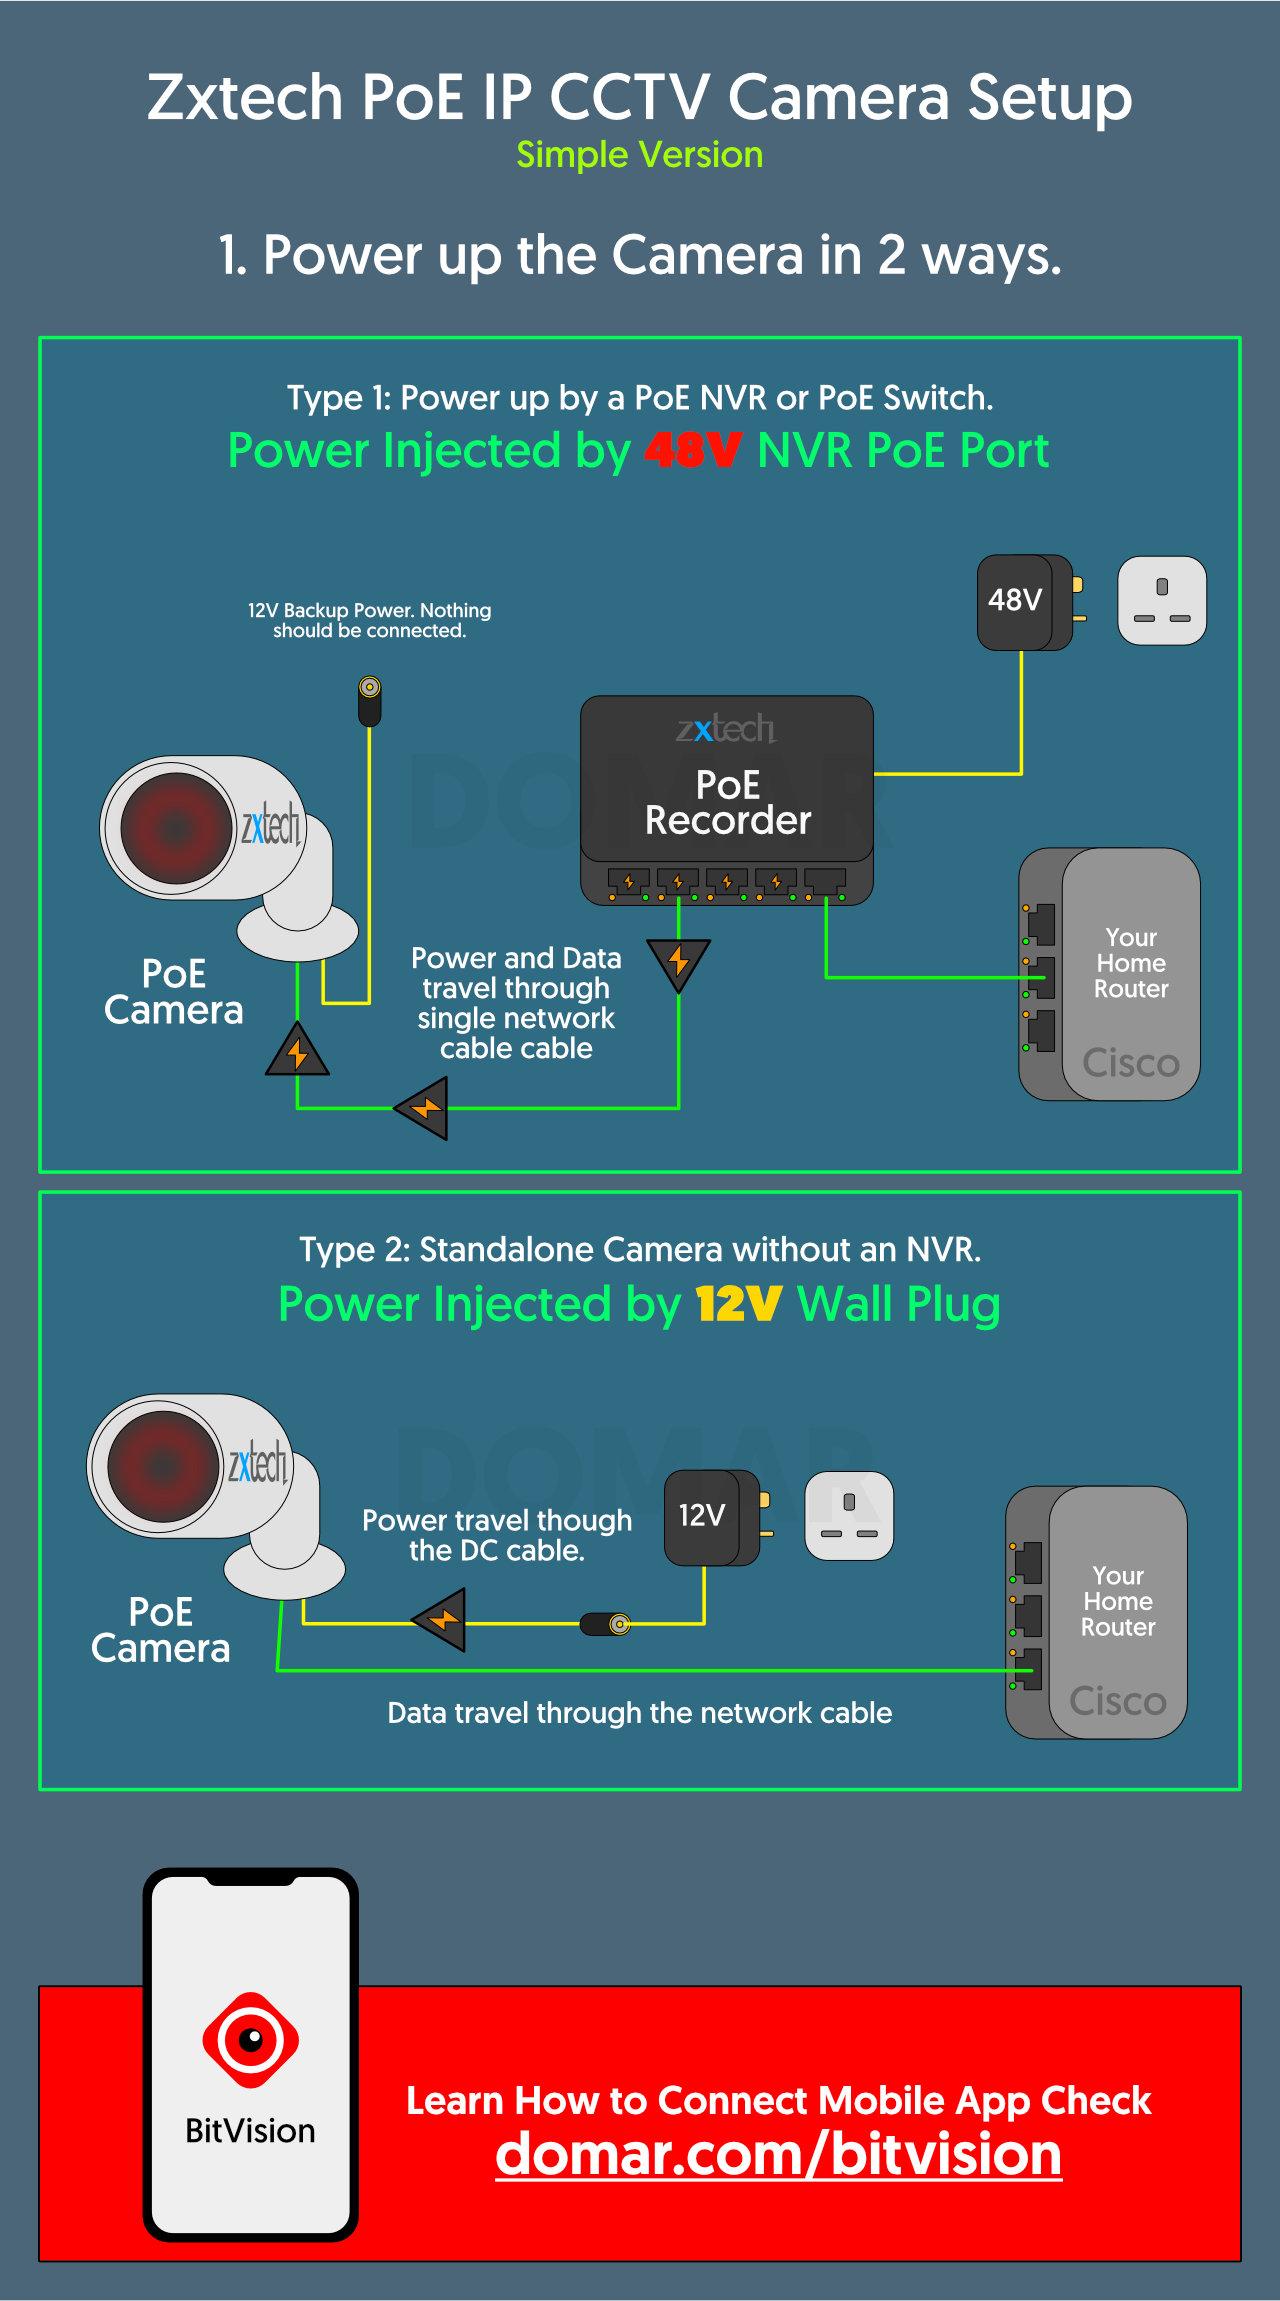 How to Quickly Setup a Zxtech IP CCTV Cameras